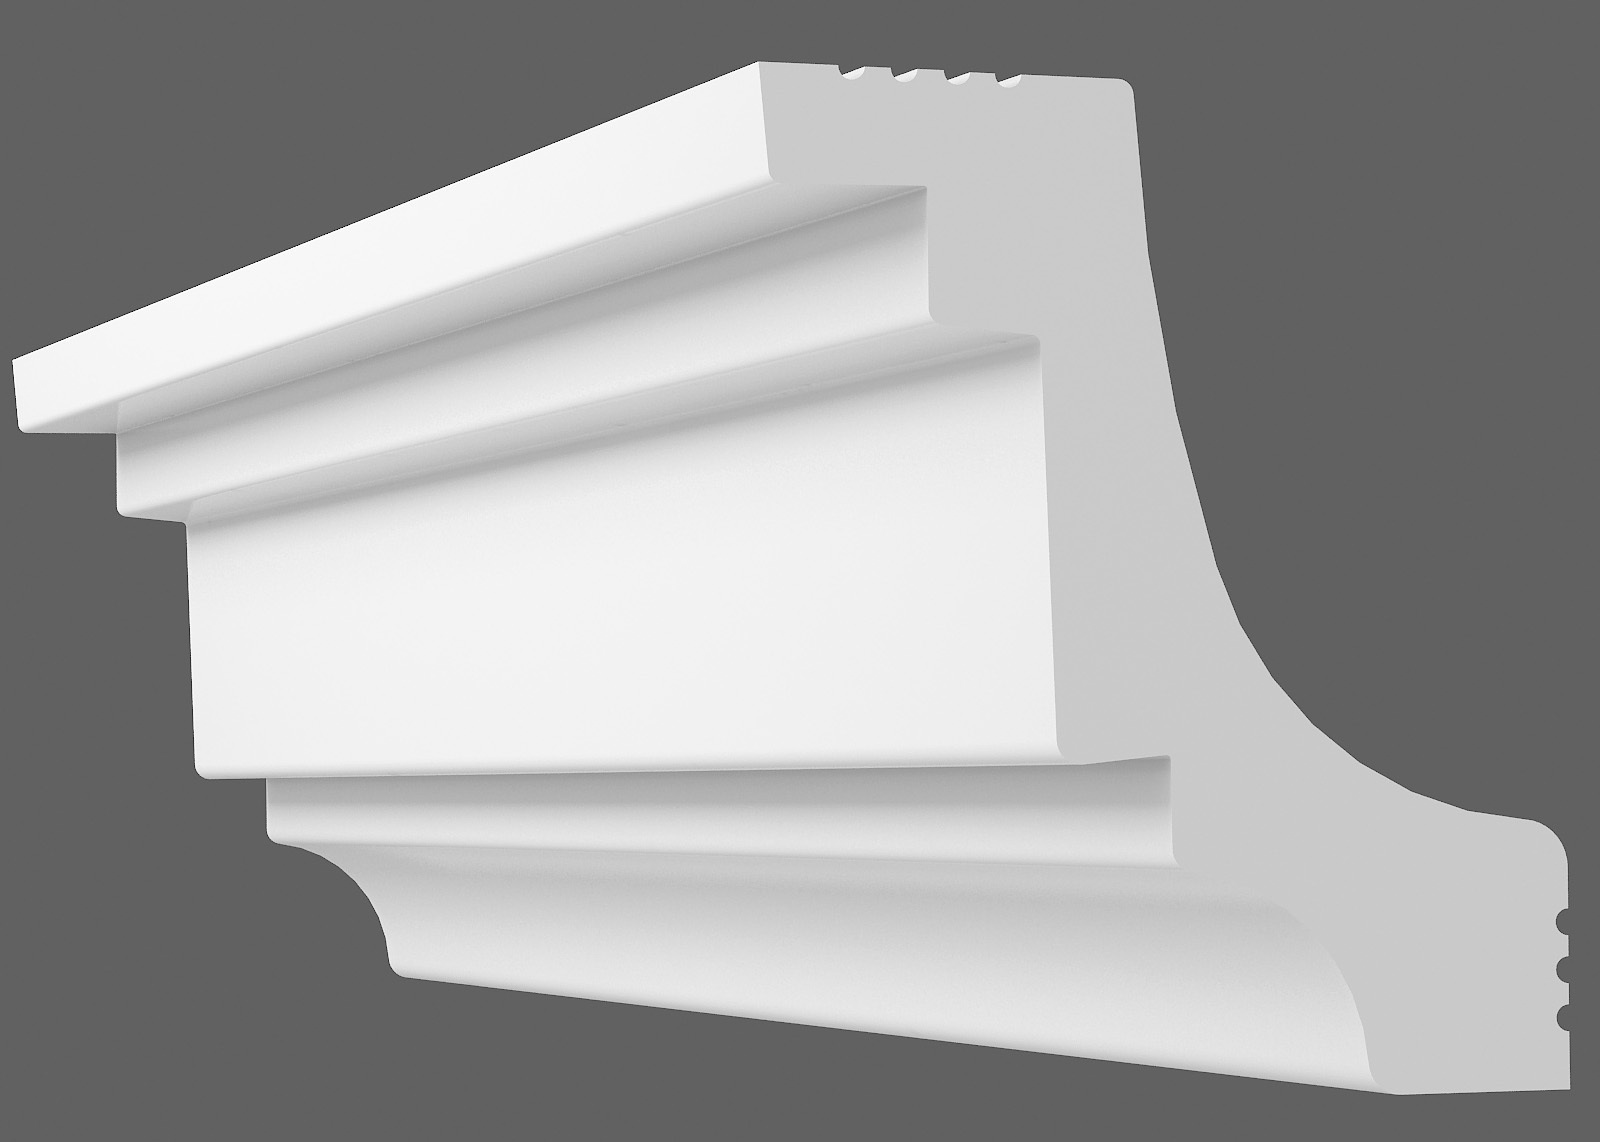 Потолочный плинтус S-45 (Размер:40х40мм)